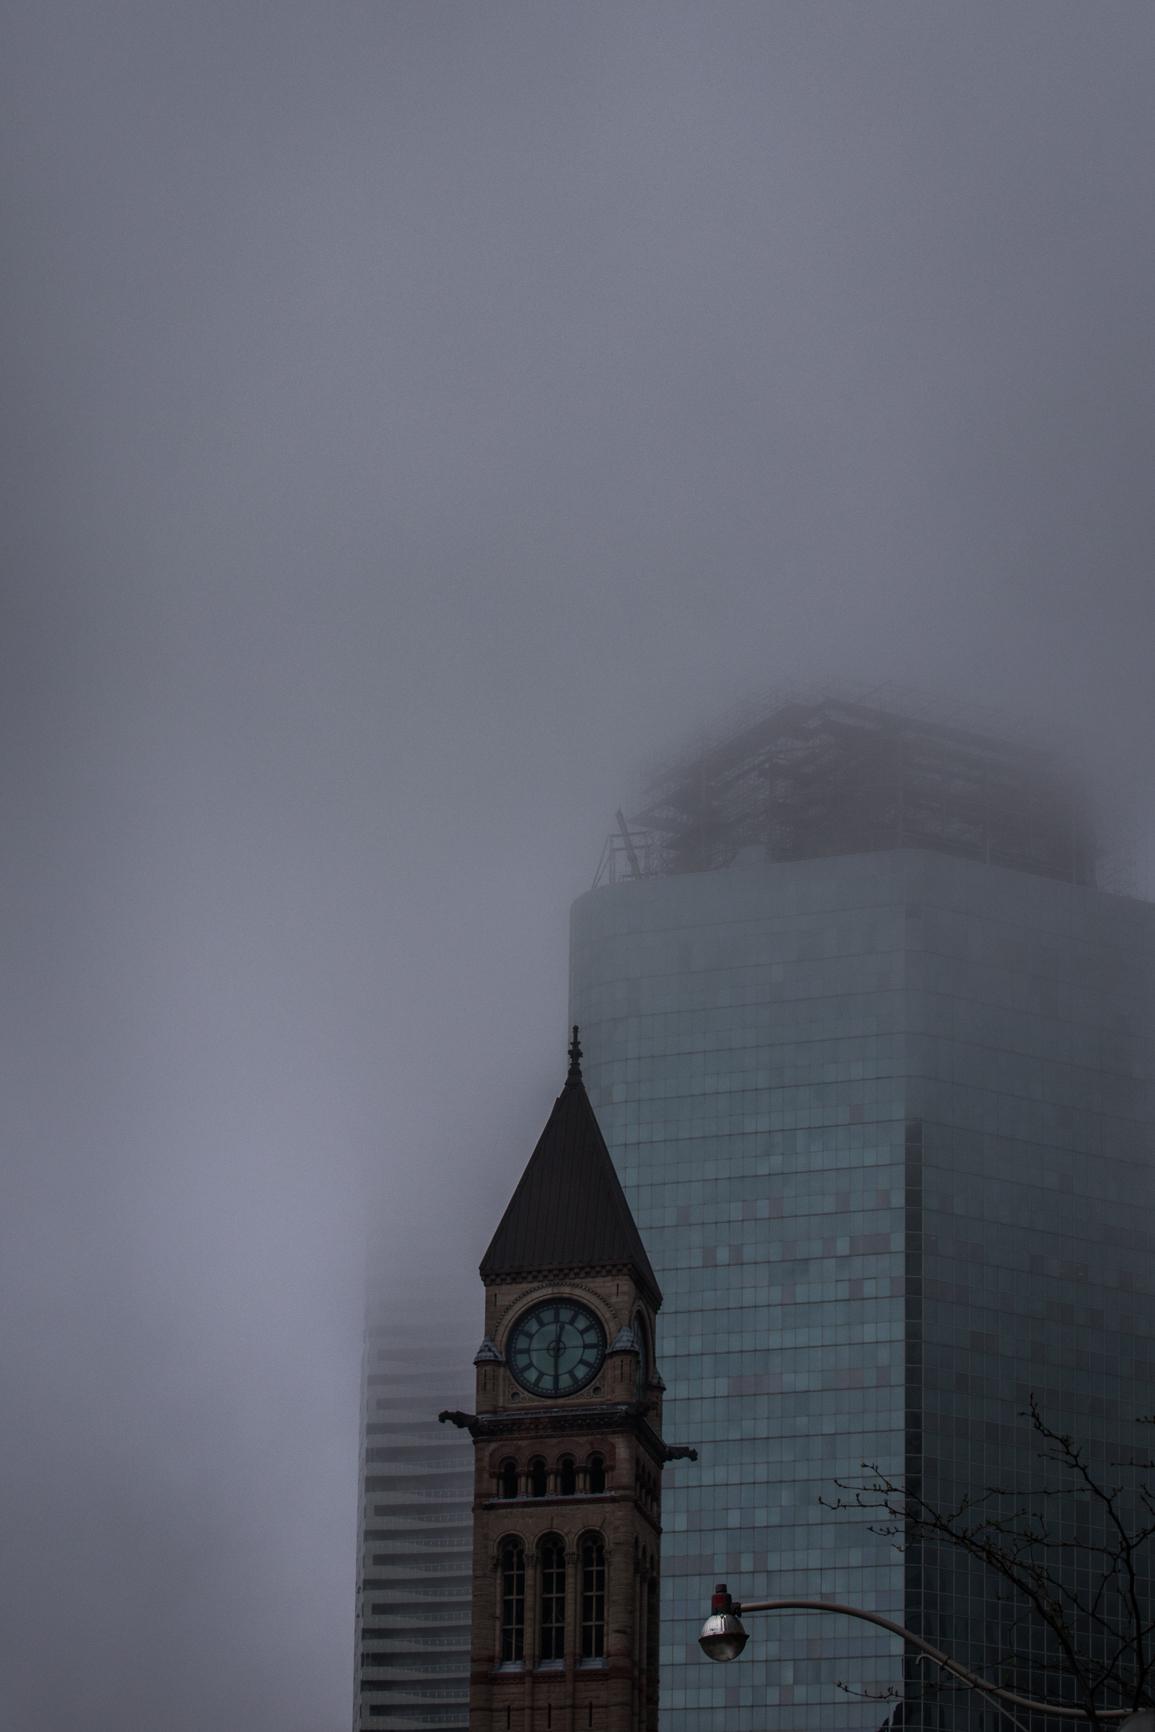 Clock Tower, Old City Hall Toronto, ON 2018